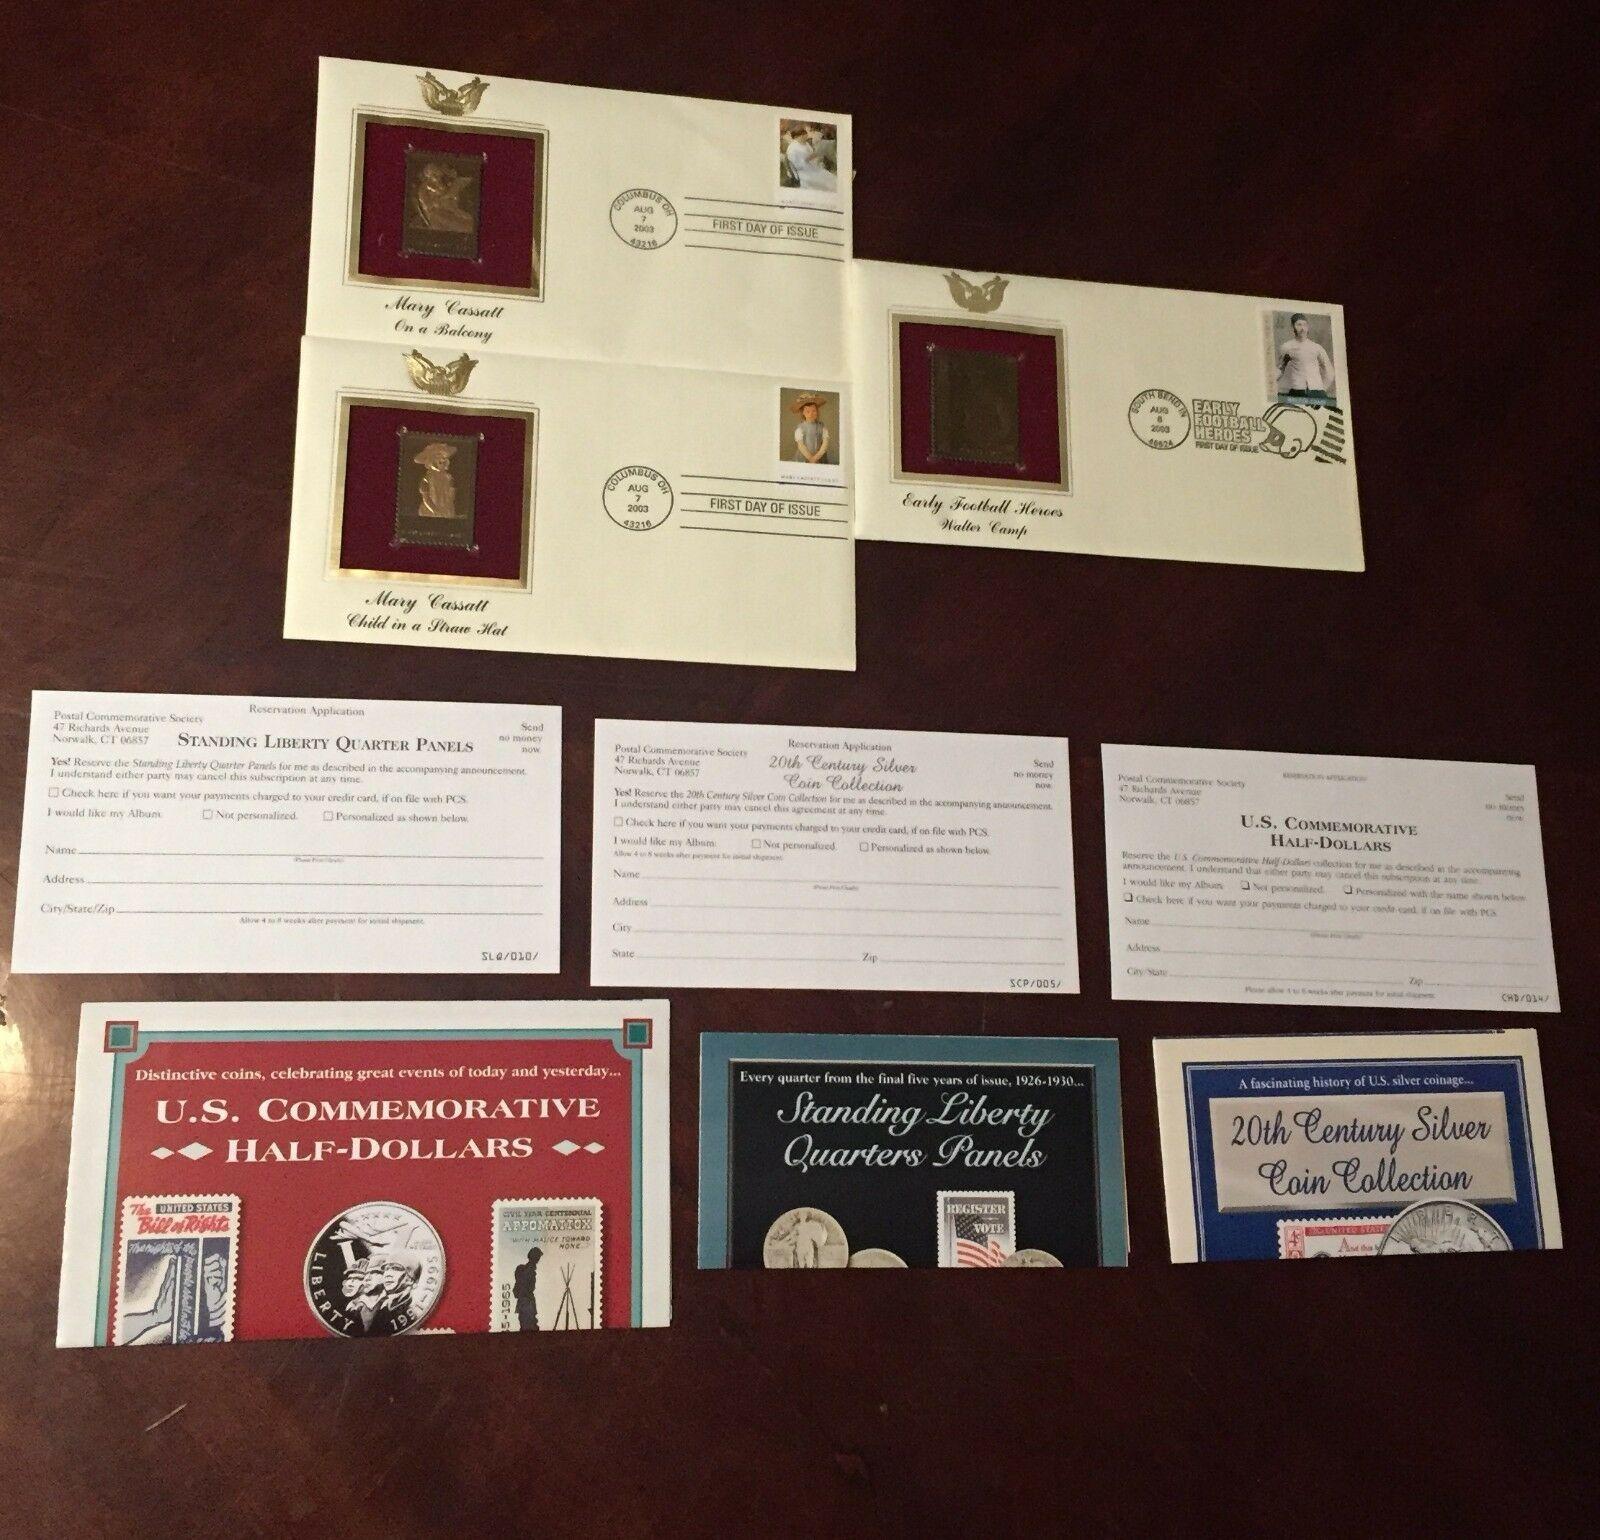 Lot of 3 GOLDEN 22K Gold Stamp Replica 1 Walter camp ~ 2 Mary Cassatt (Balcony/S image 4